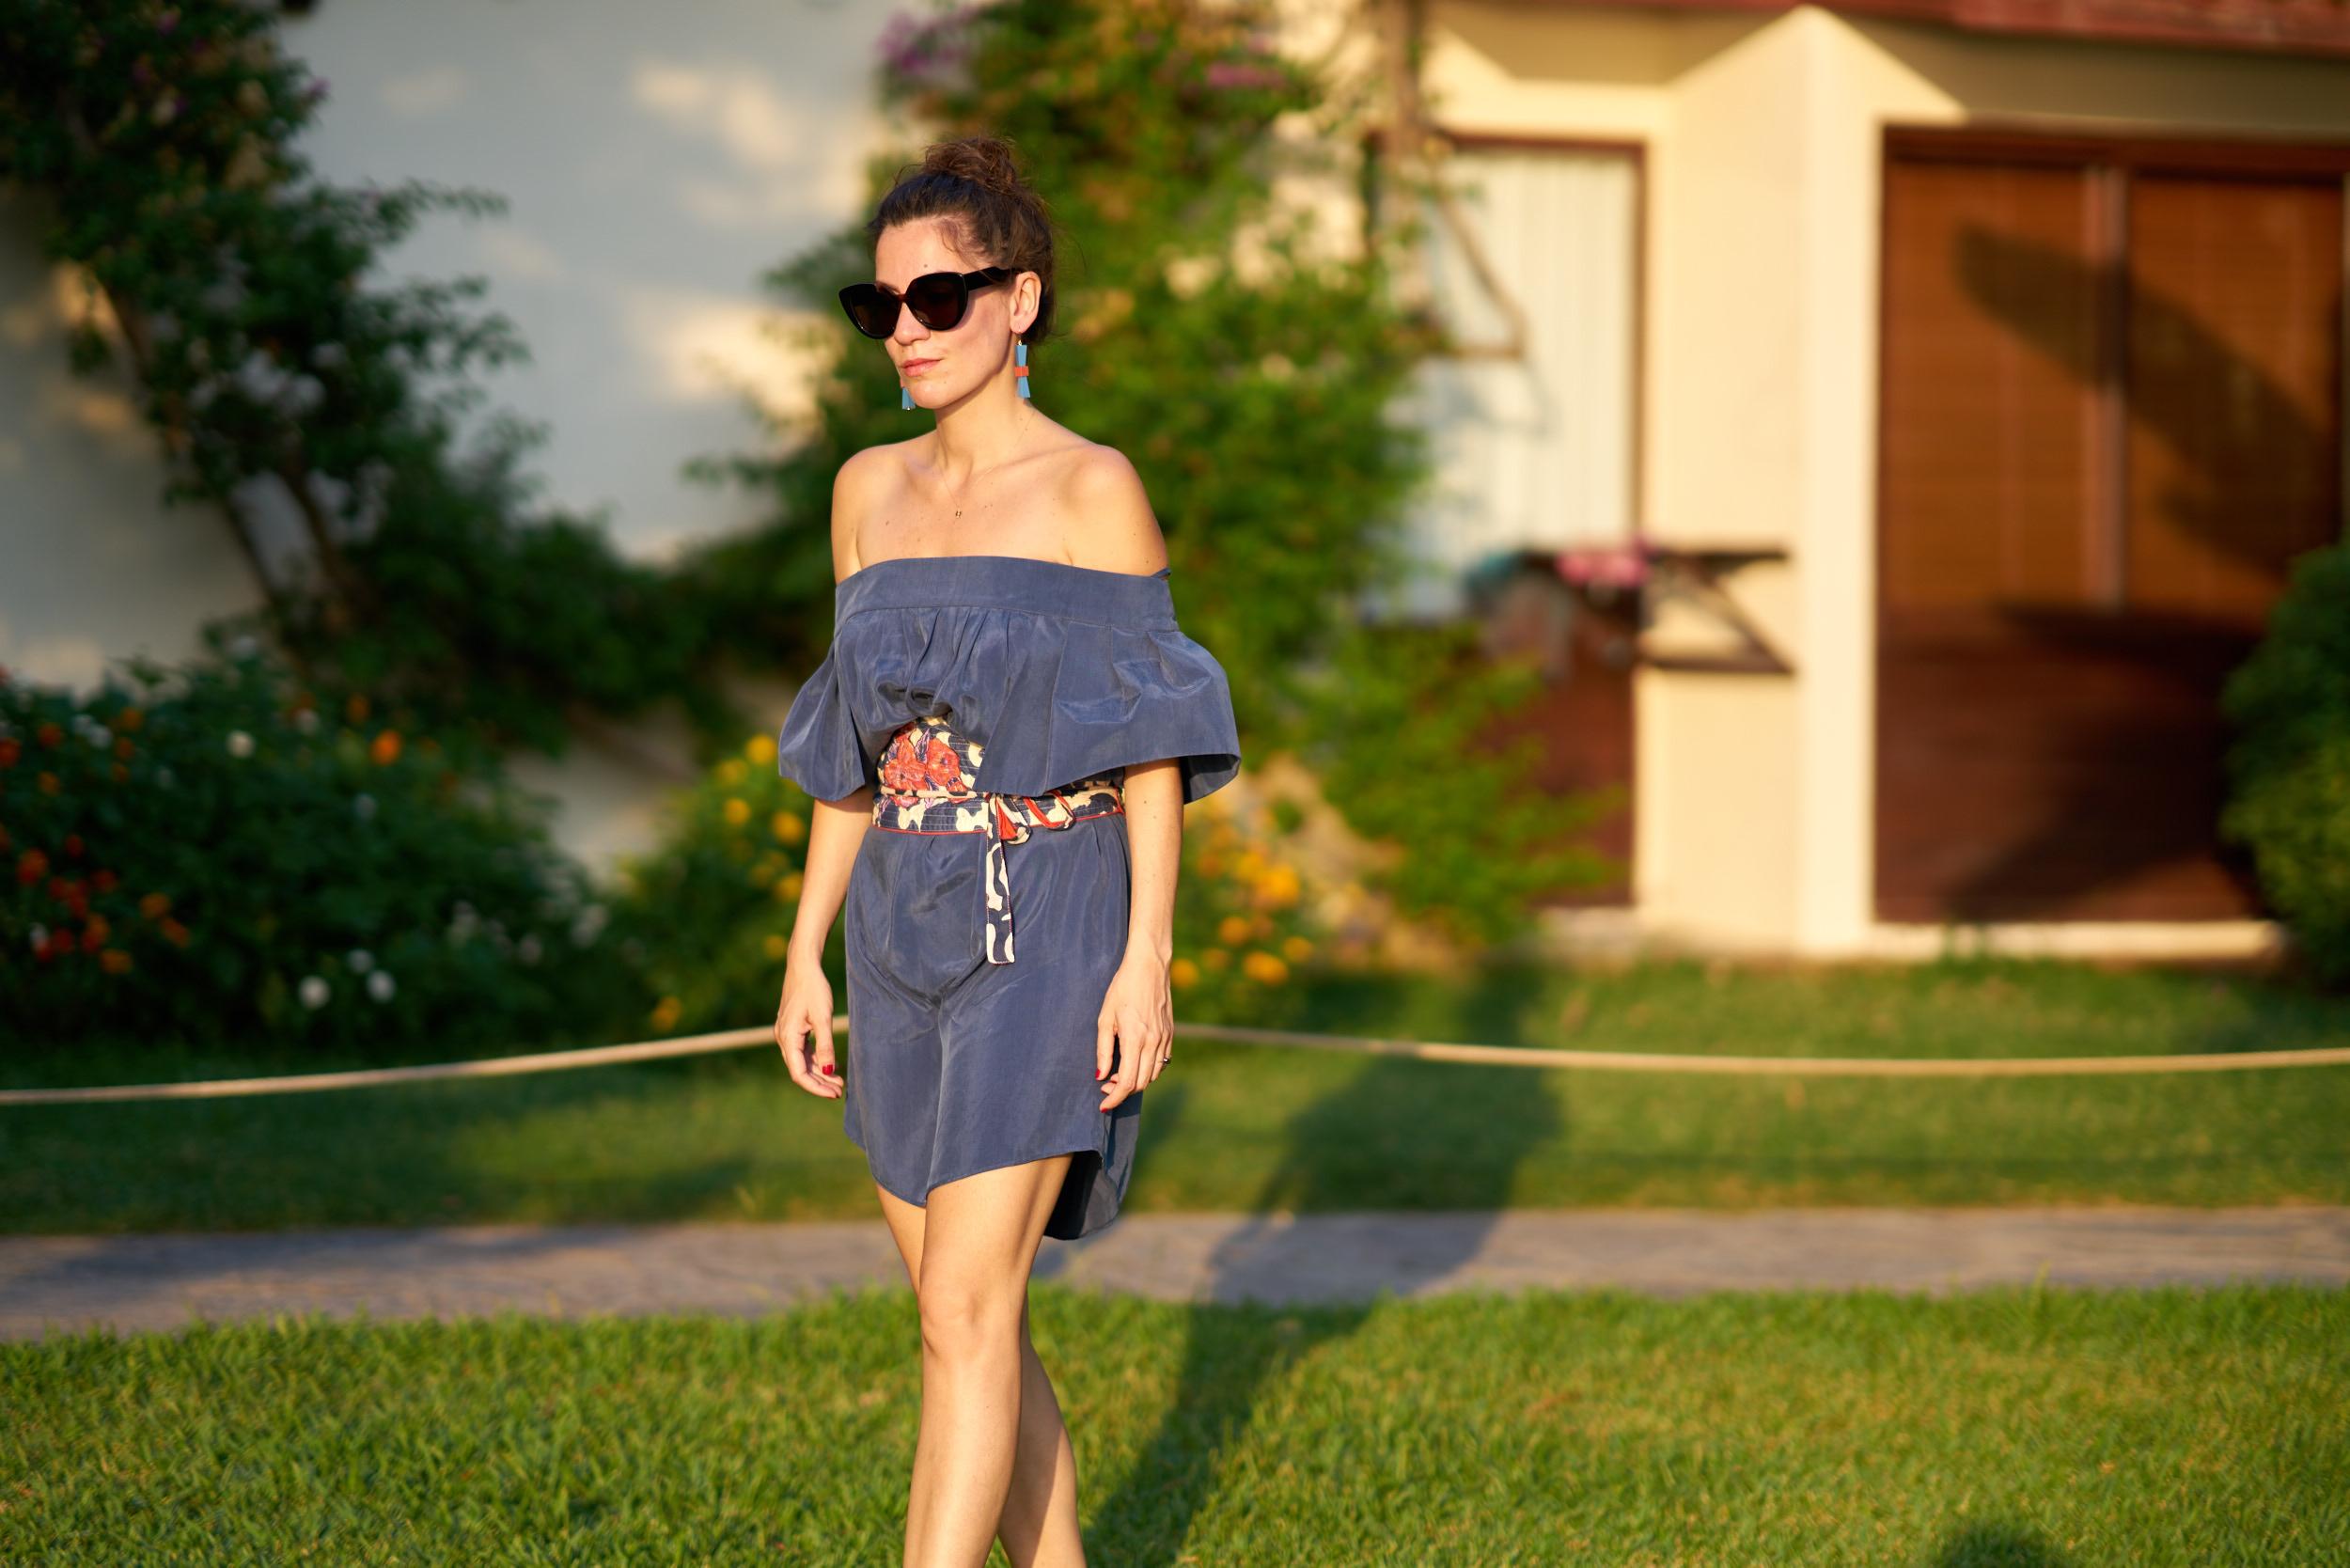 billur saatci, offnegiysem, street style, turkish style blogger, hillside beach club, pia, pia brand, lisa corti, marine, tory burch, apres ski